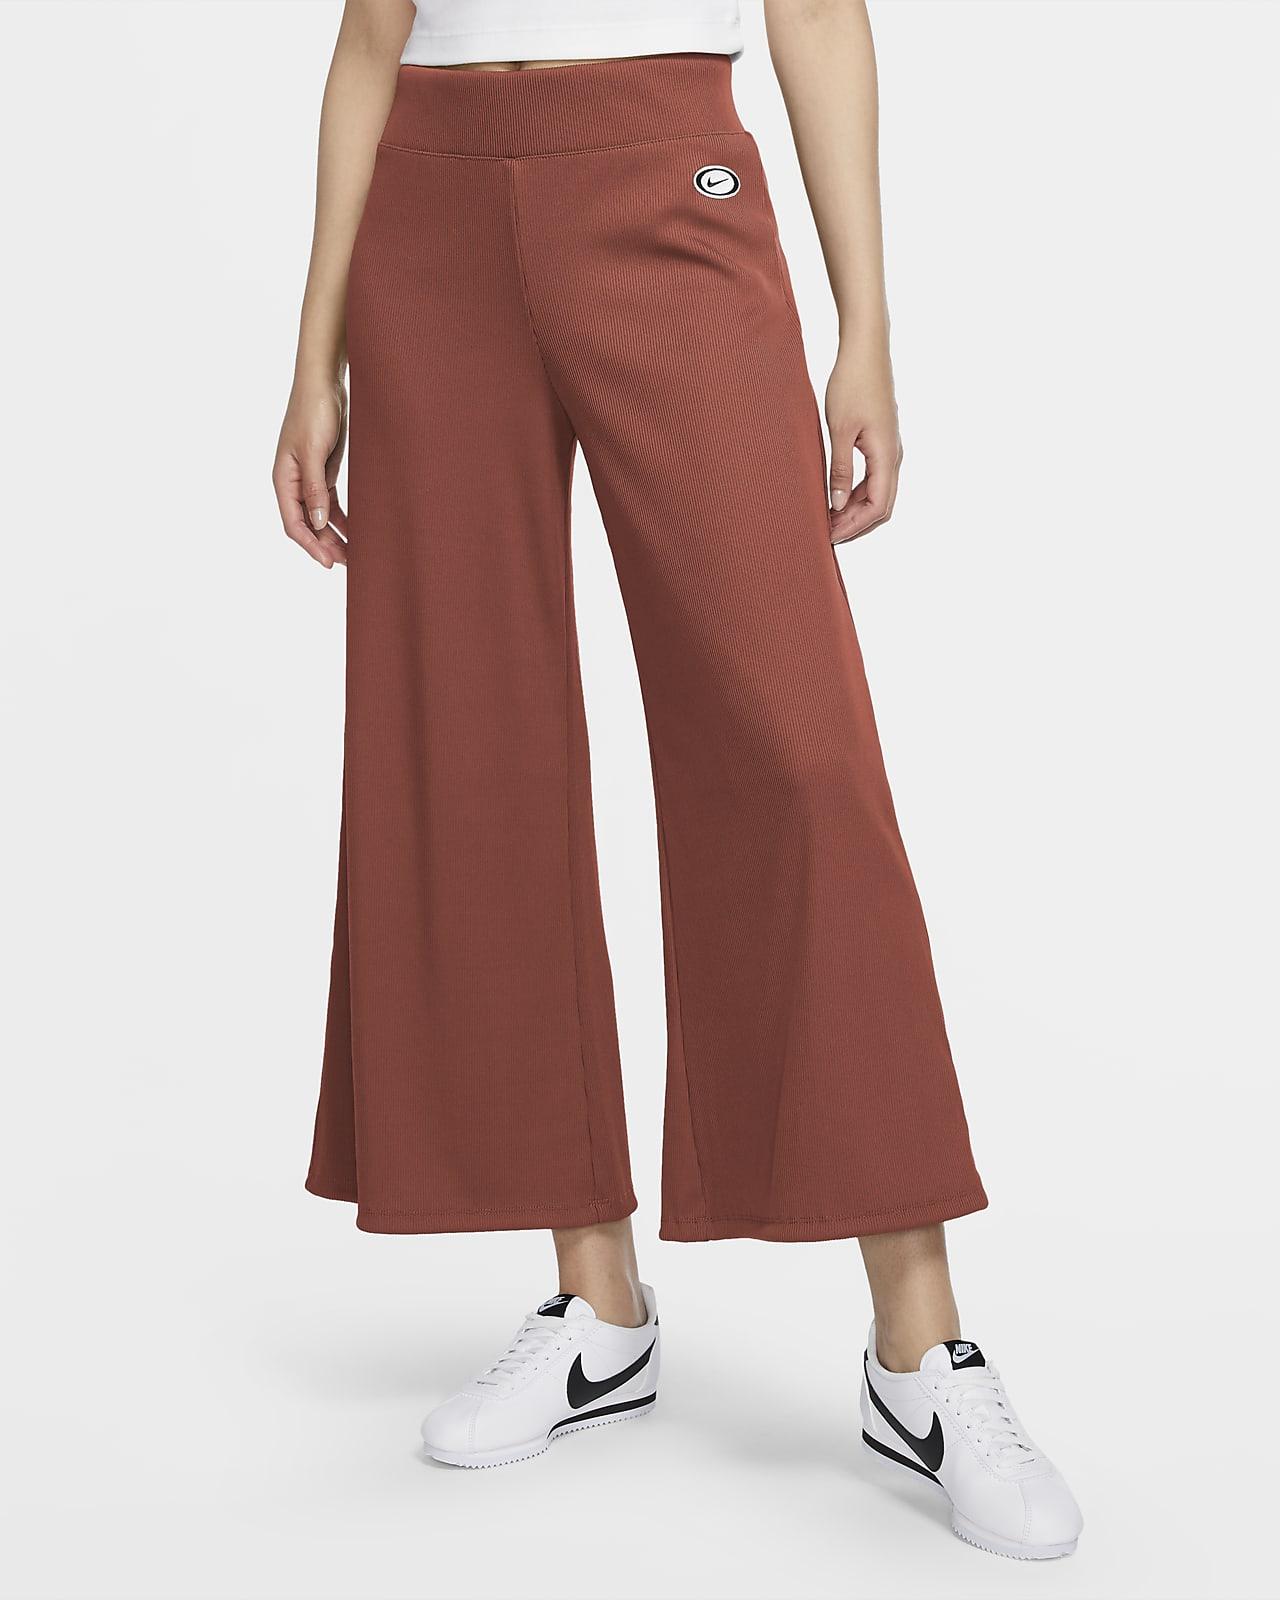 Nike Sportswear Pantalón elástico - Mujer